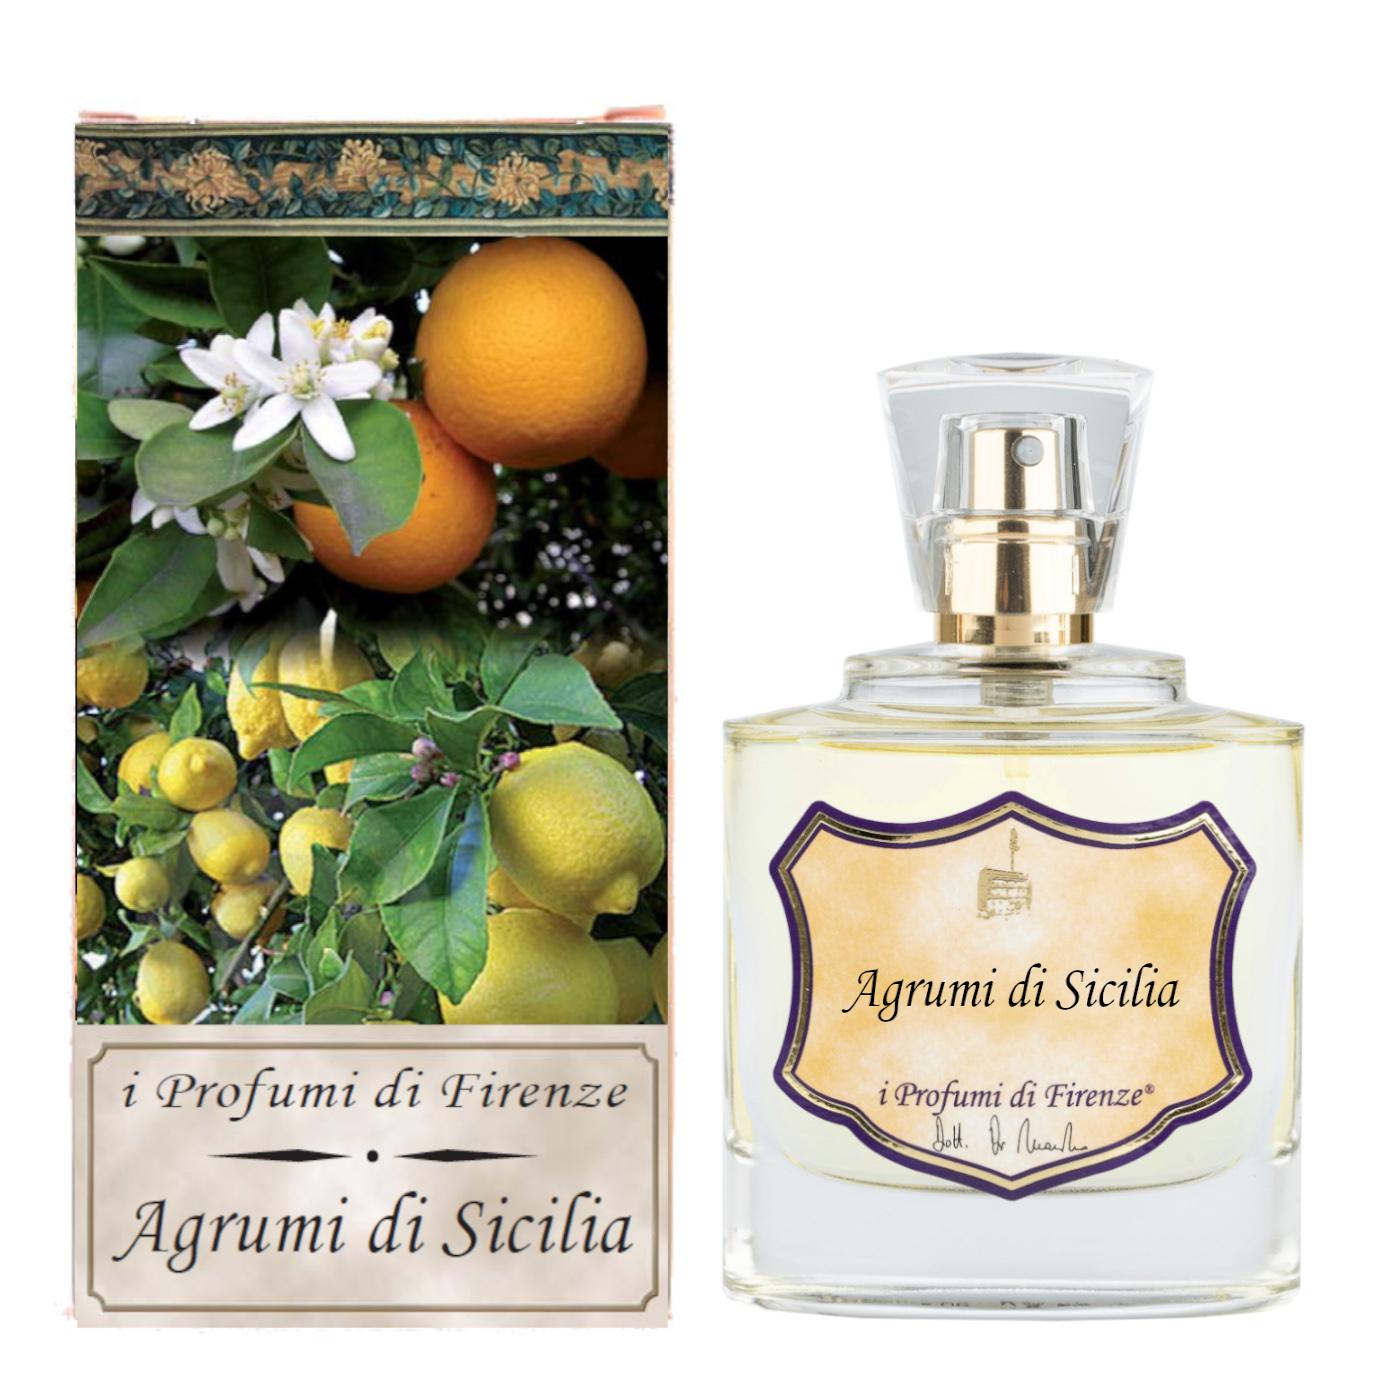 AGRUMI DI SICILIA - Eau de Parfum-0